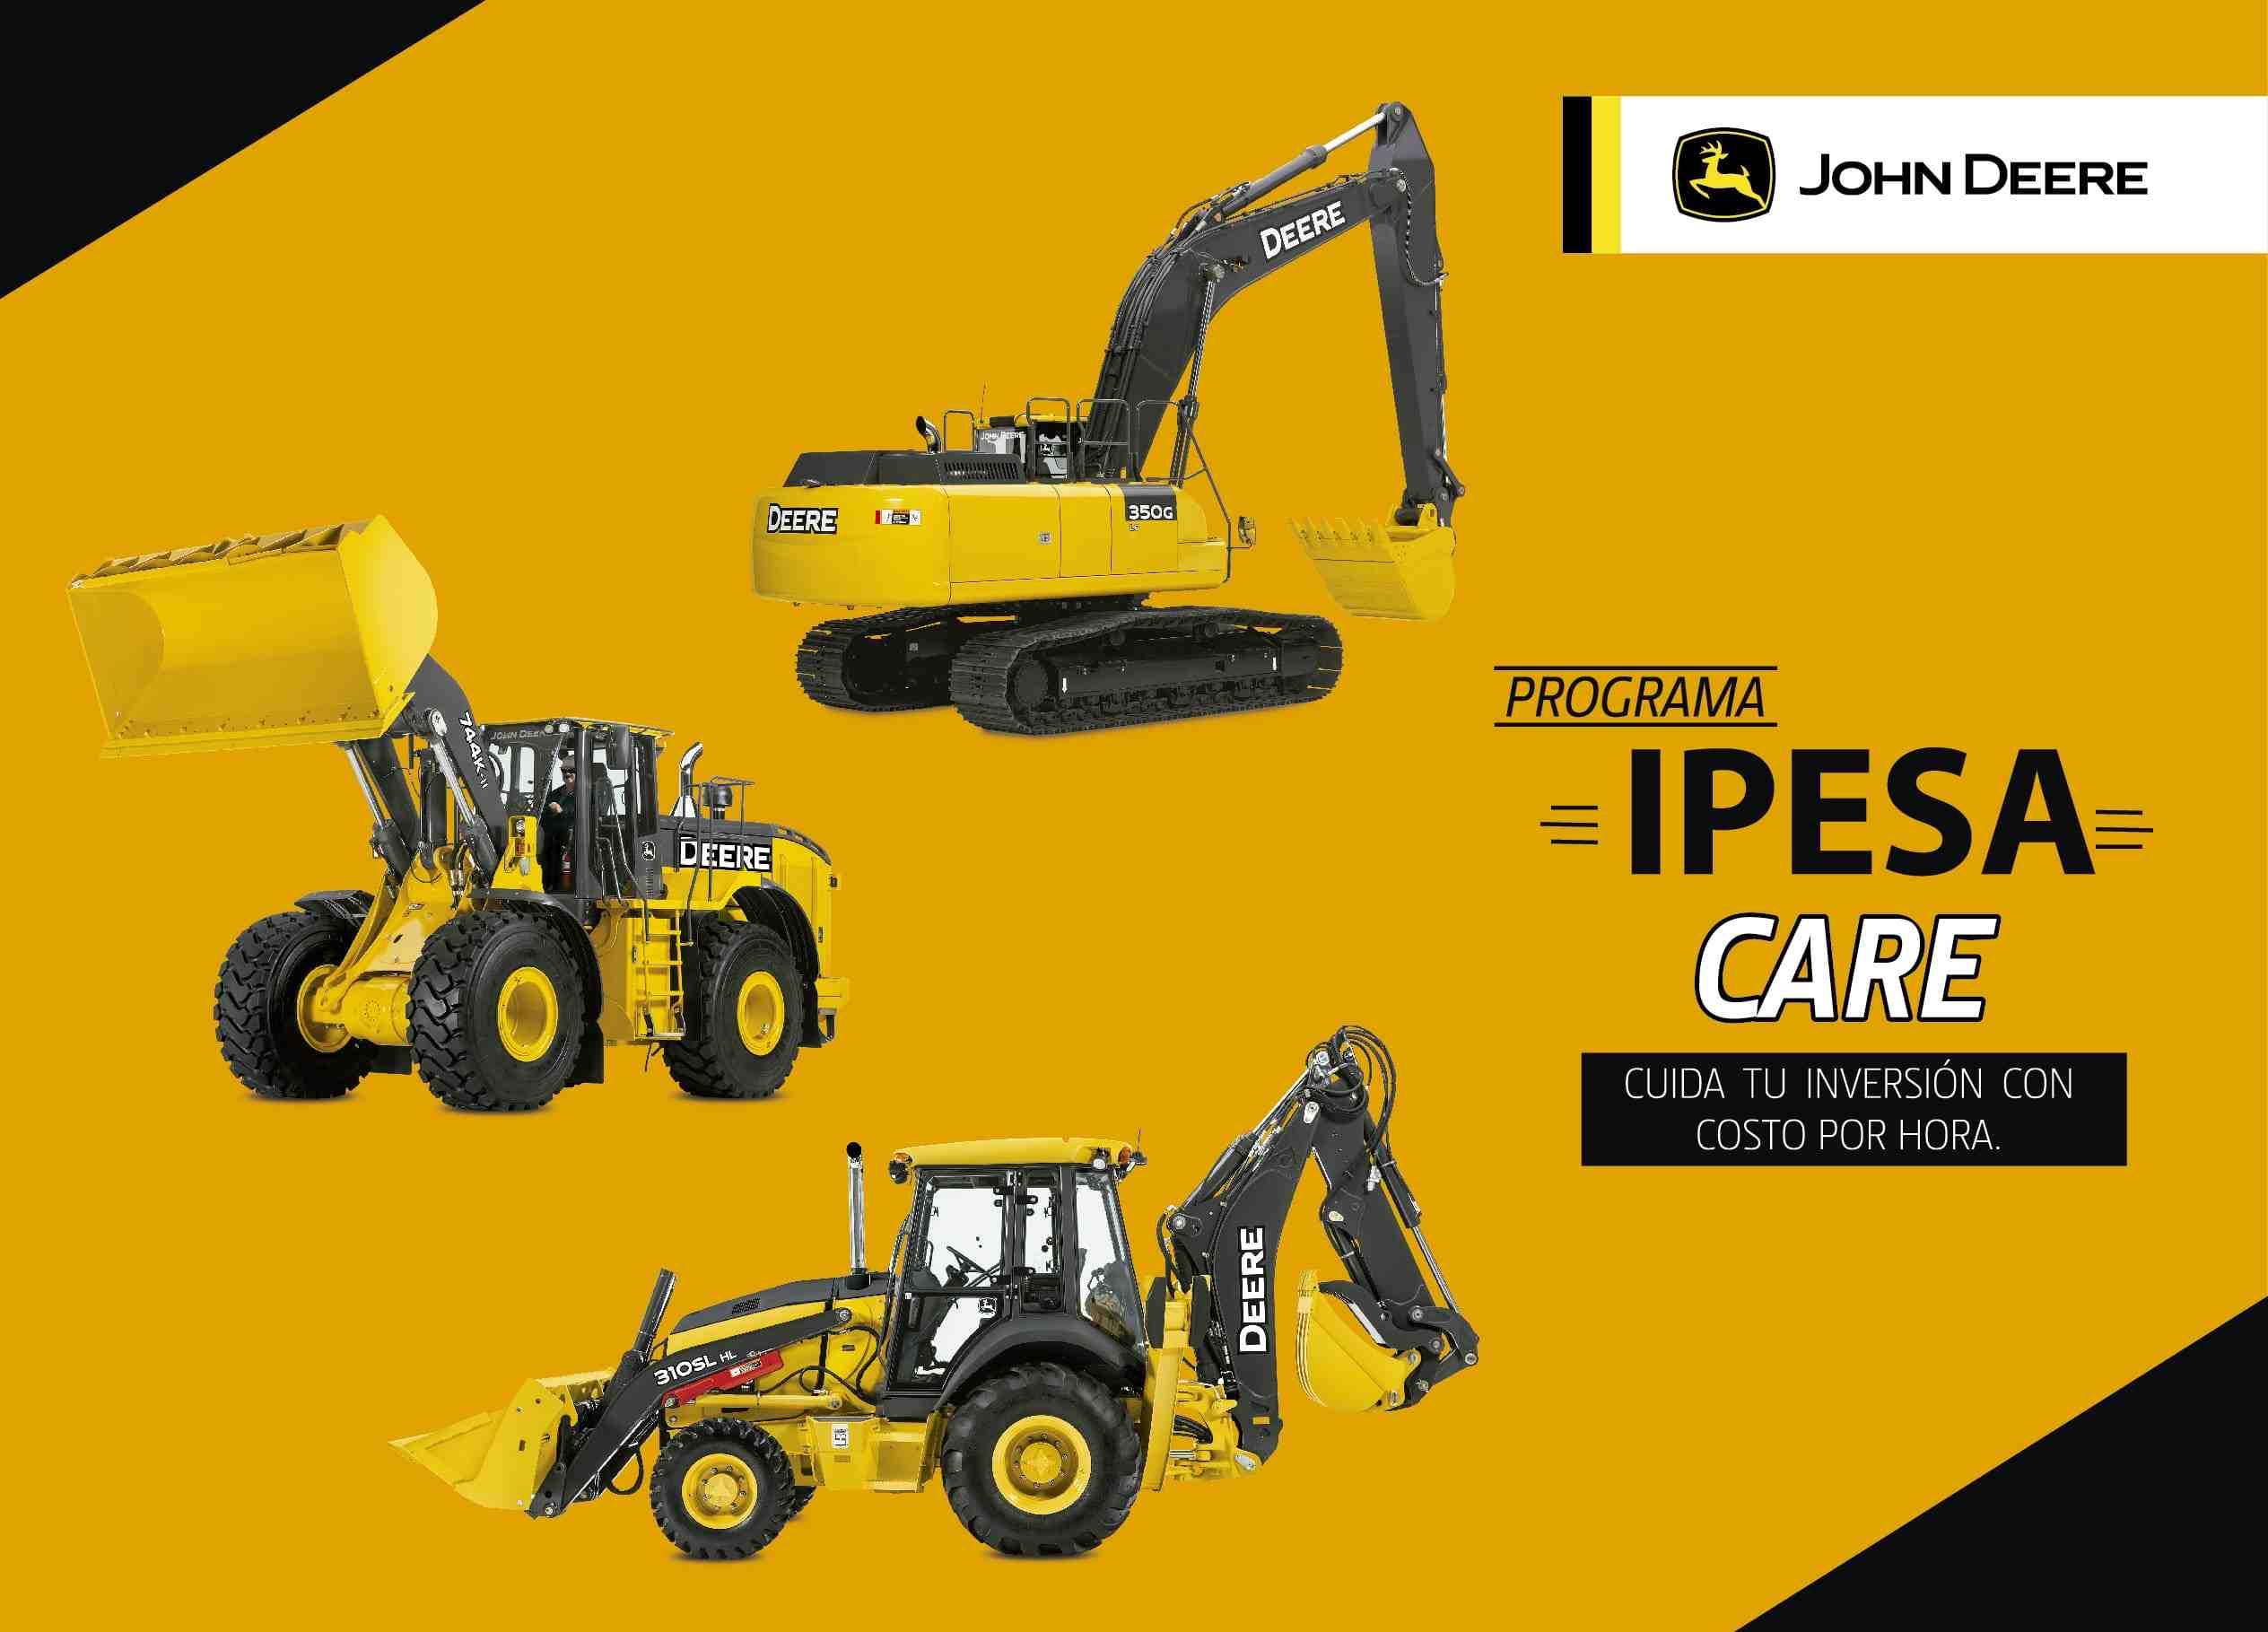 ipesa care mantenimiento maquinarias equipos